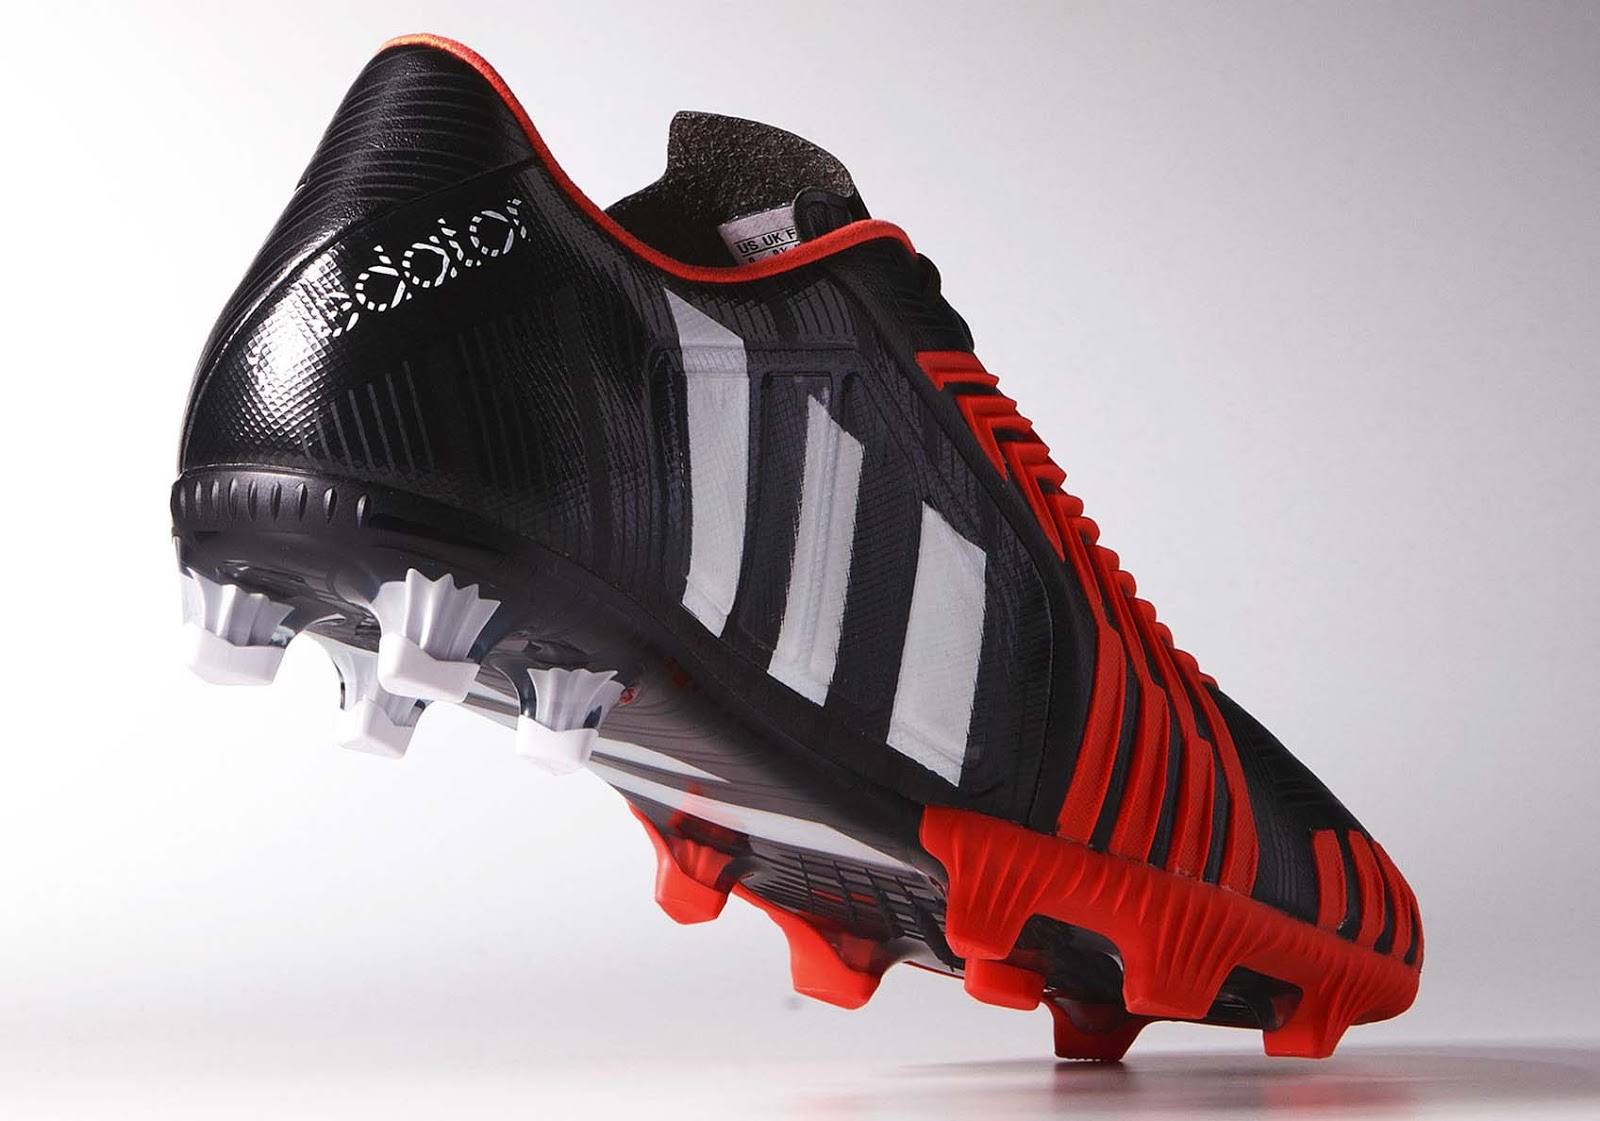 black red adidas predator instinct 2015 boot released